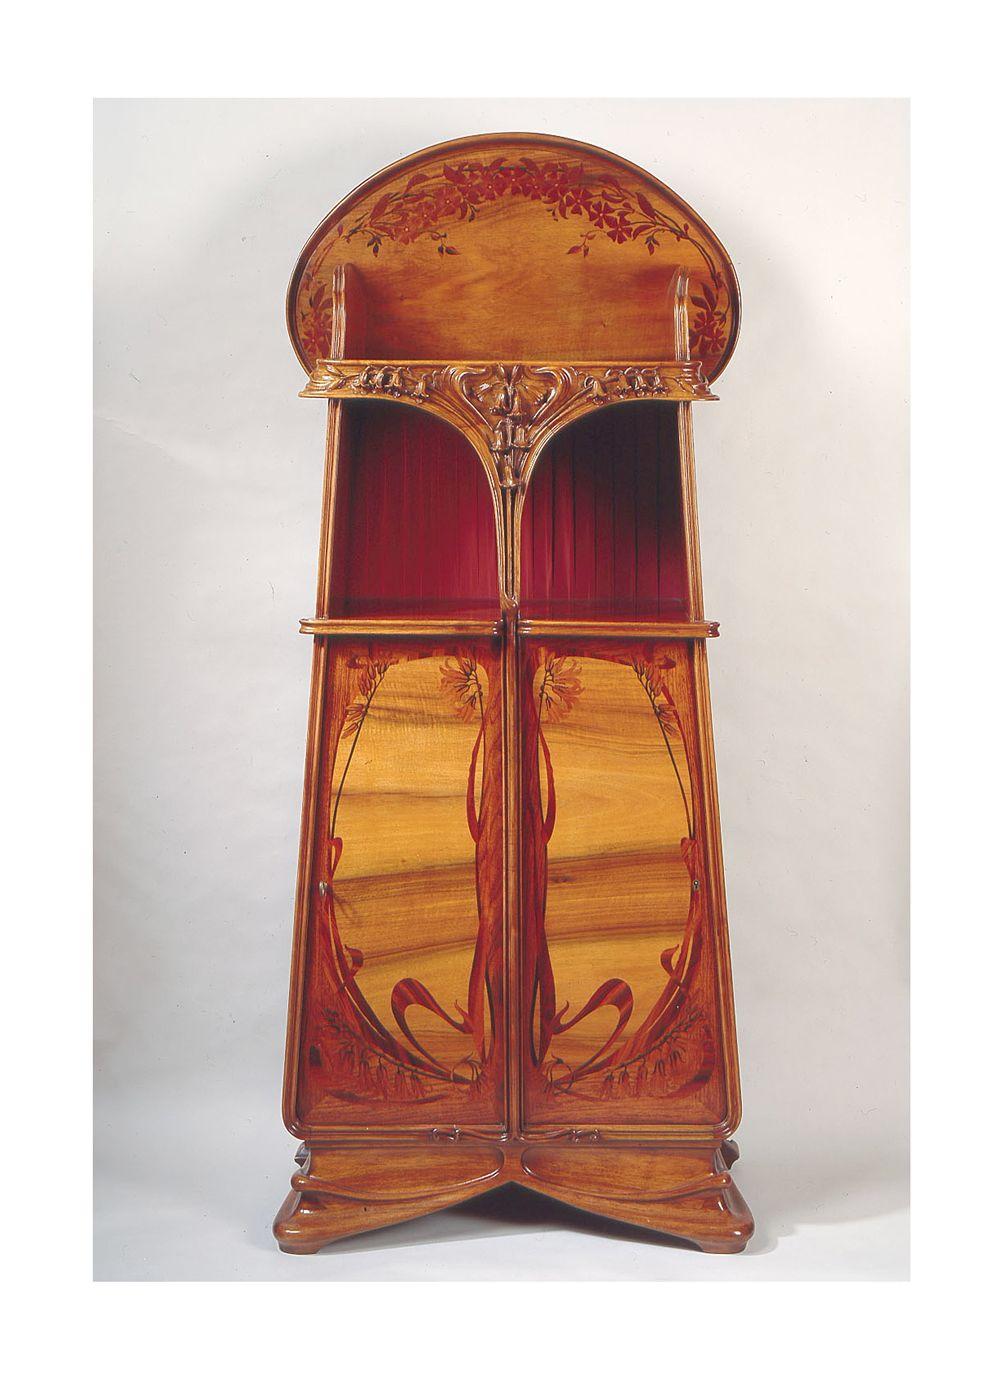 Louis Majorelle Vitrine Circa 1900 Ok Art Nouveau Art Nouveau Design Art Nouveau Furniture